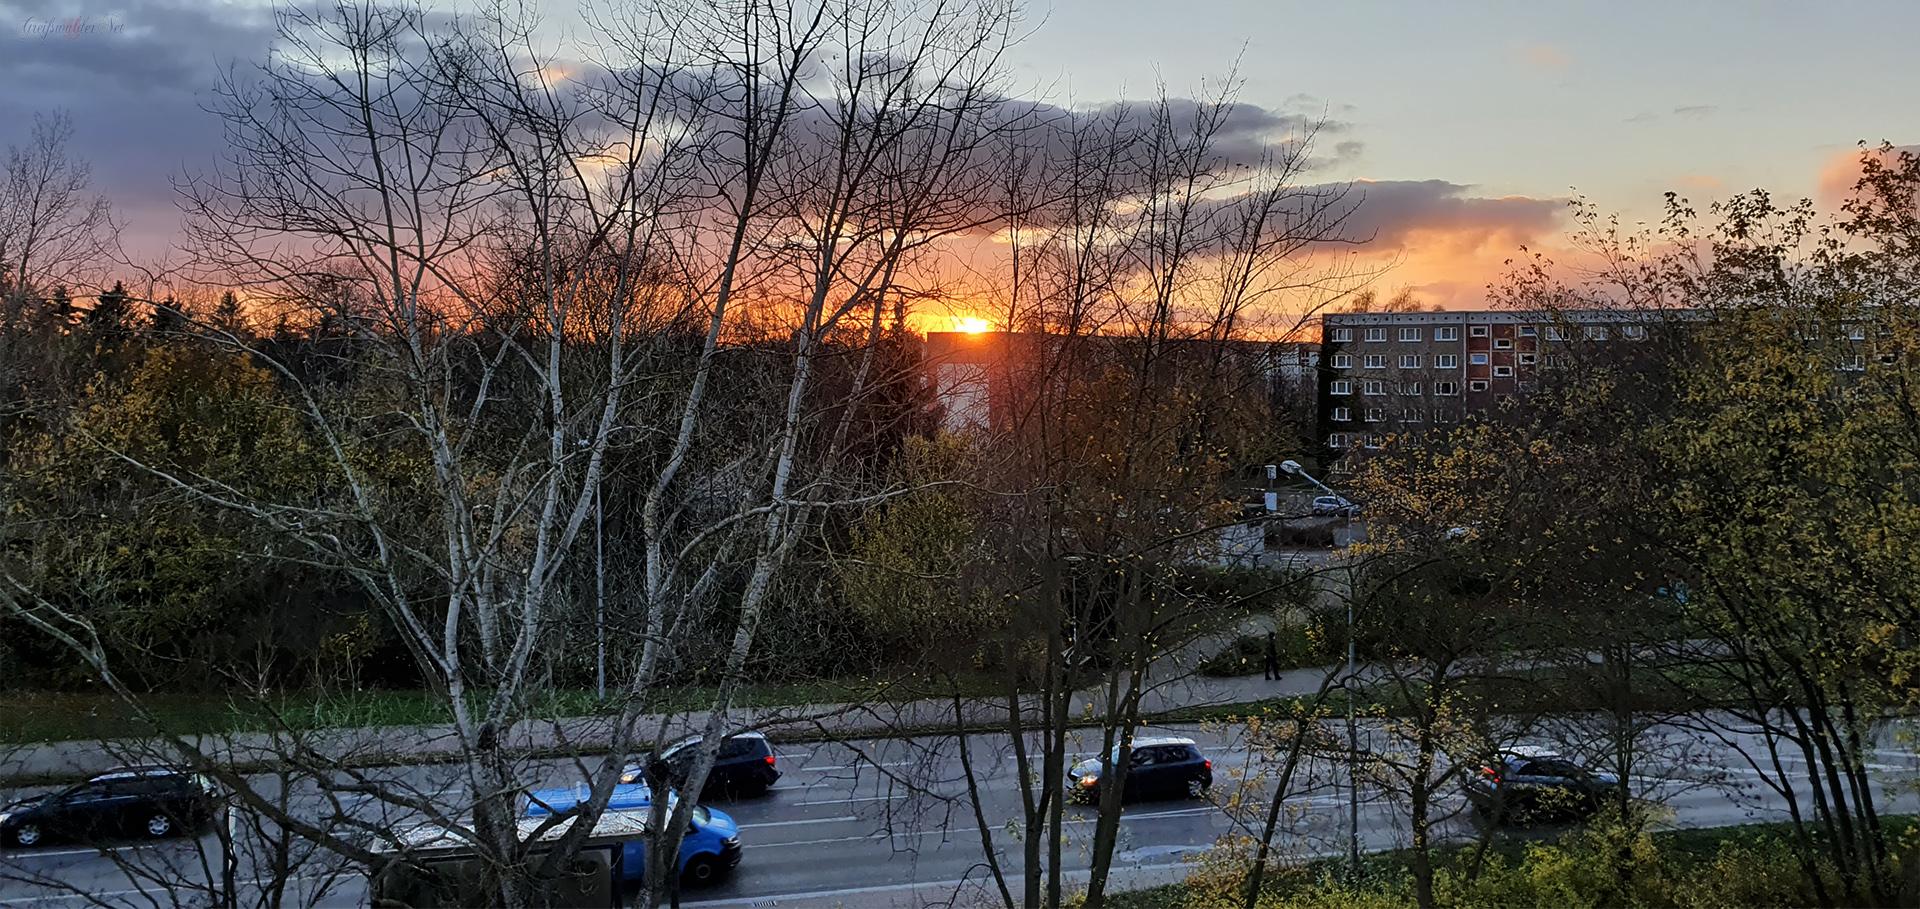 Sonnenuntergang in Greifswald